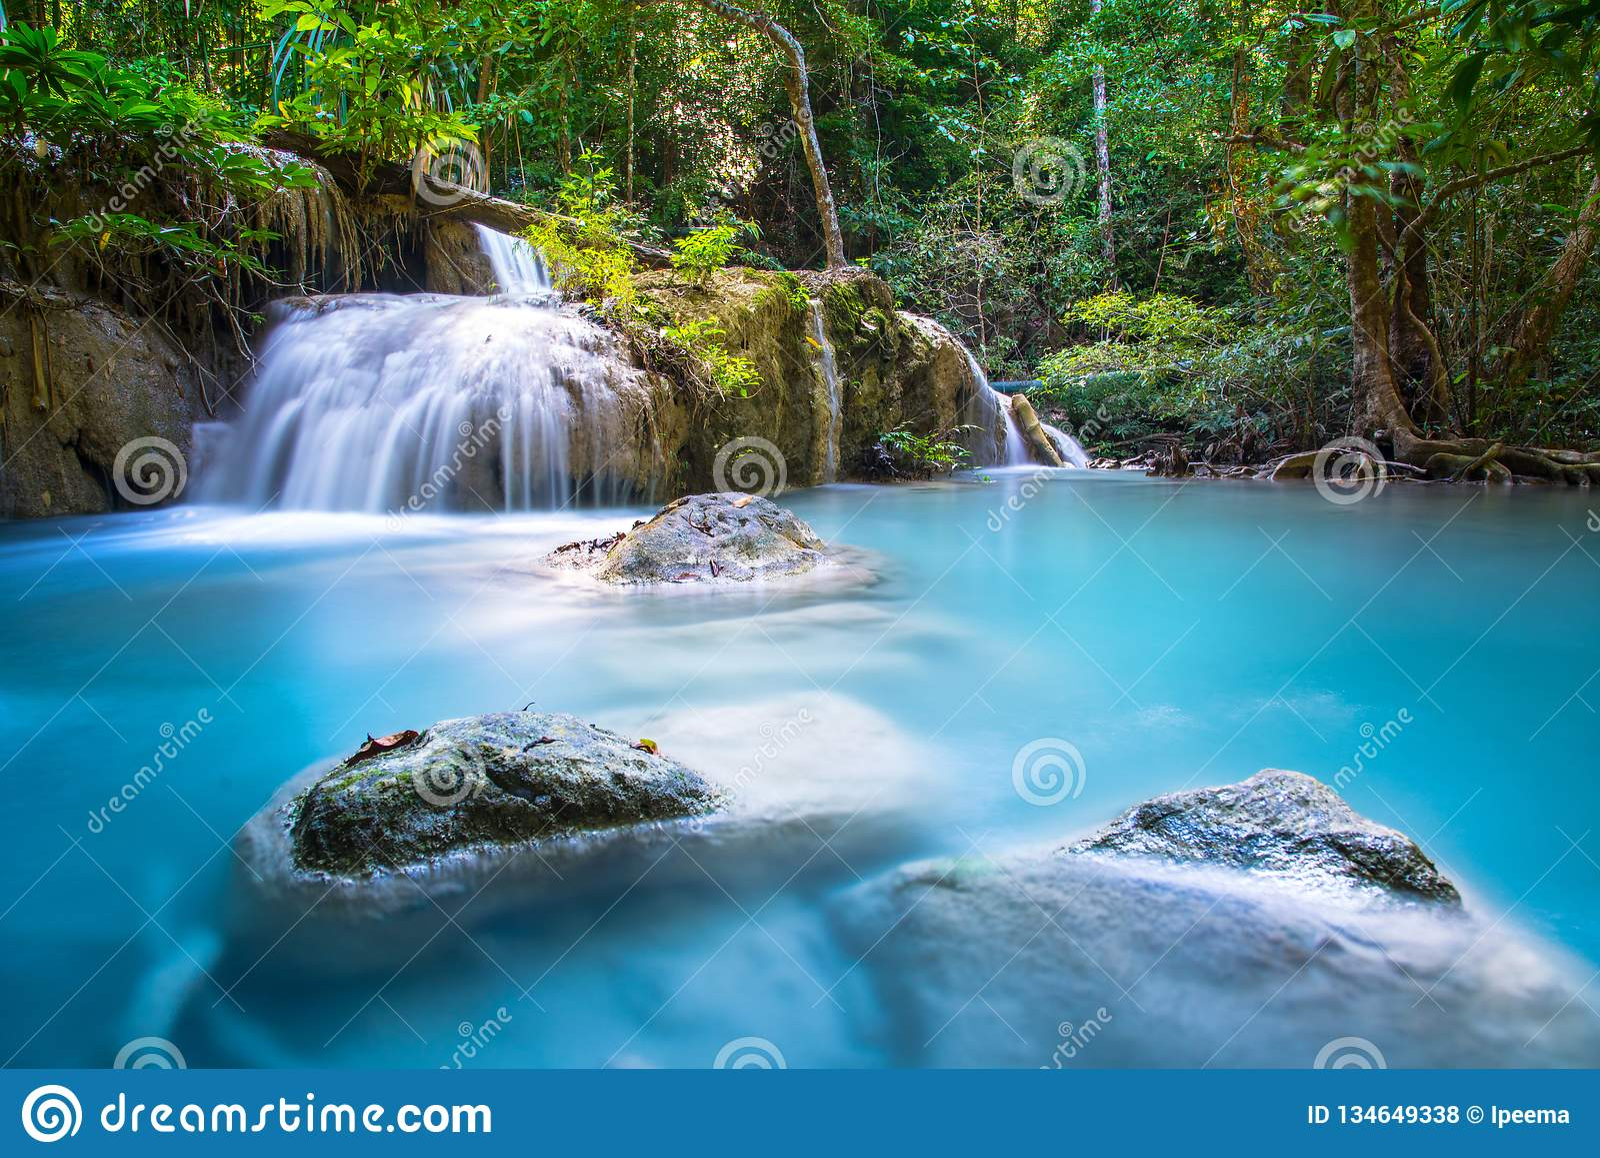 Mooie Waterval in diep bos bij Erawan-waterval Nationaal Park, Kanchanaburi,